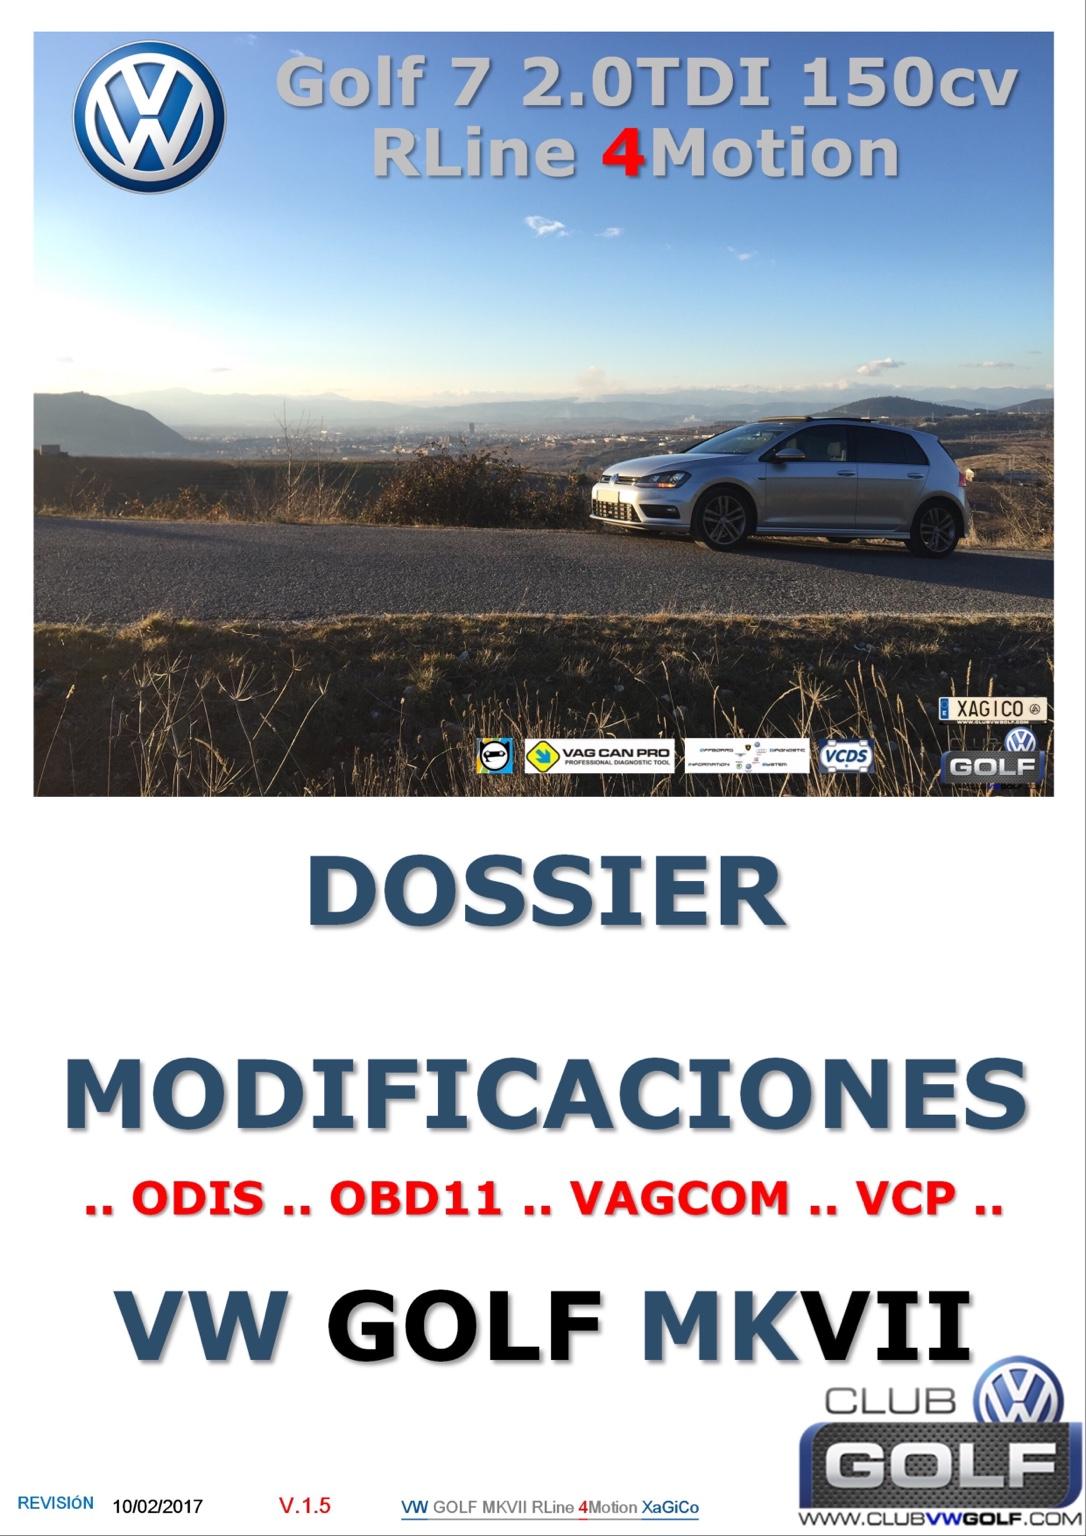 TUTORIAL MODS VW GOLF MKVII - Modifying your Golf R MK7